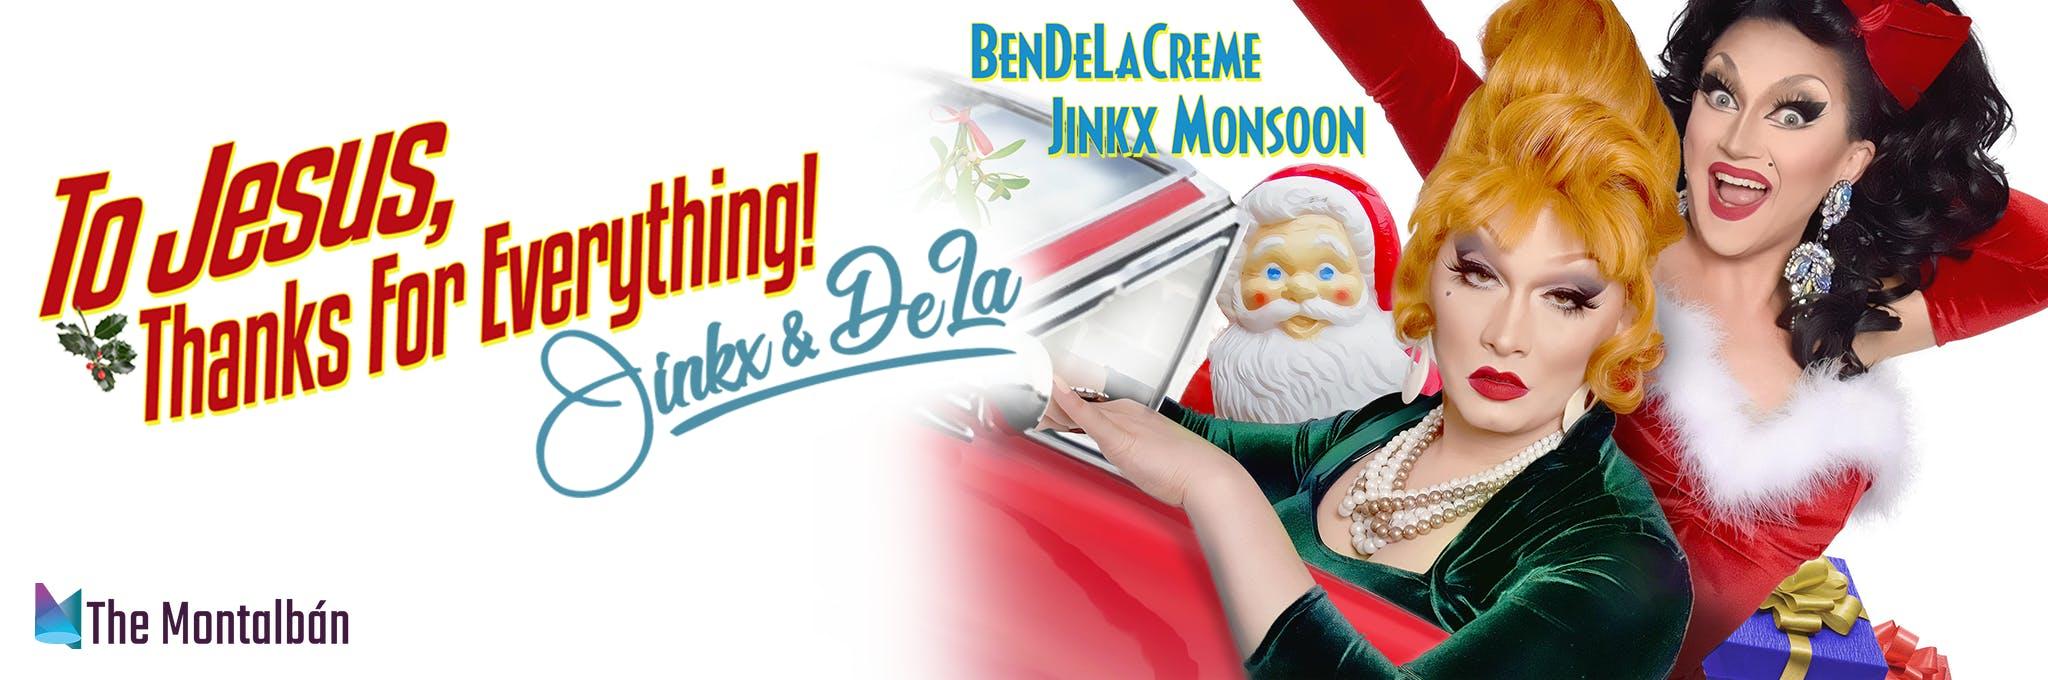 To Jesus, Thanks for Everything! Jinkx & De La Logo